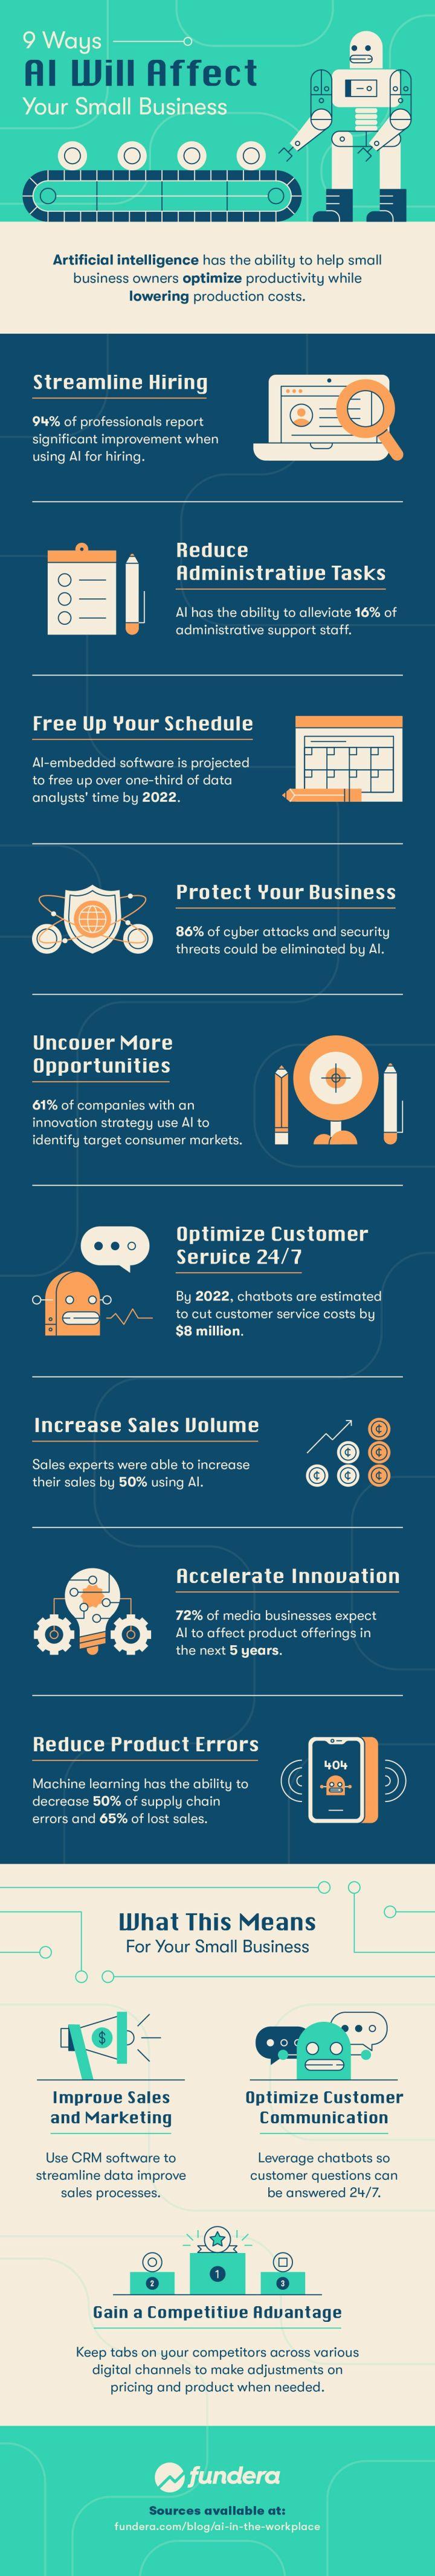 How AI Will Transform Businesses